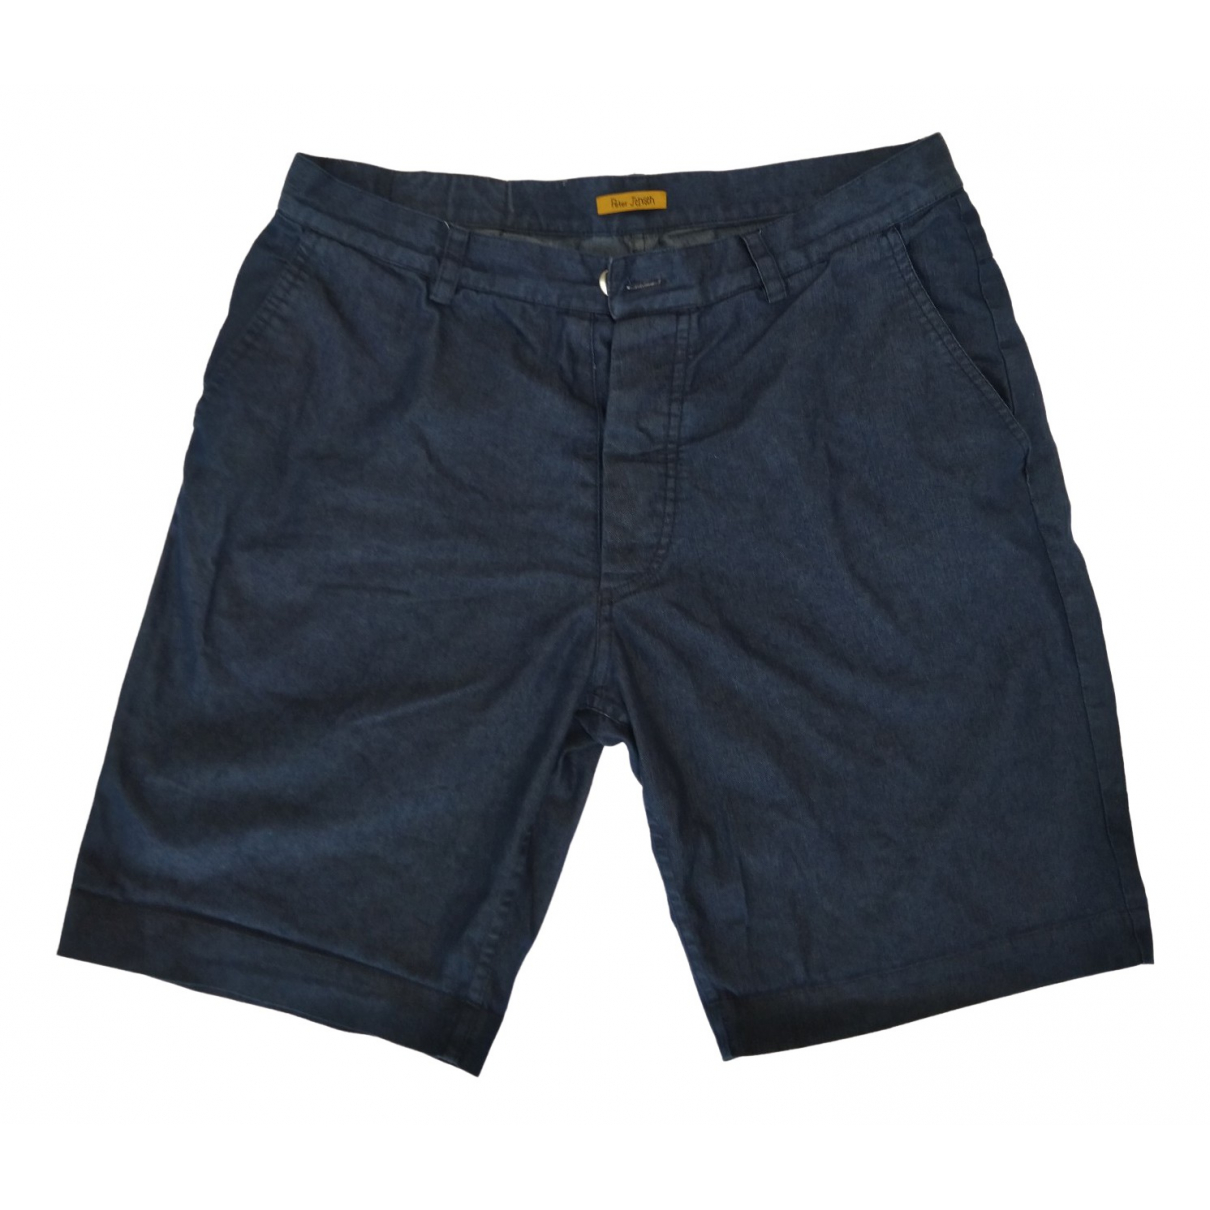 Peter Jensen \N Shorts in  Blau Baumwolle